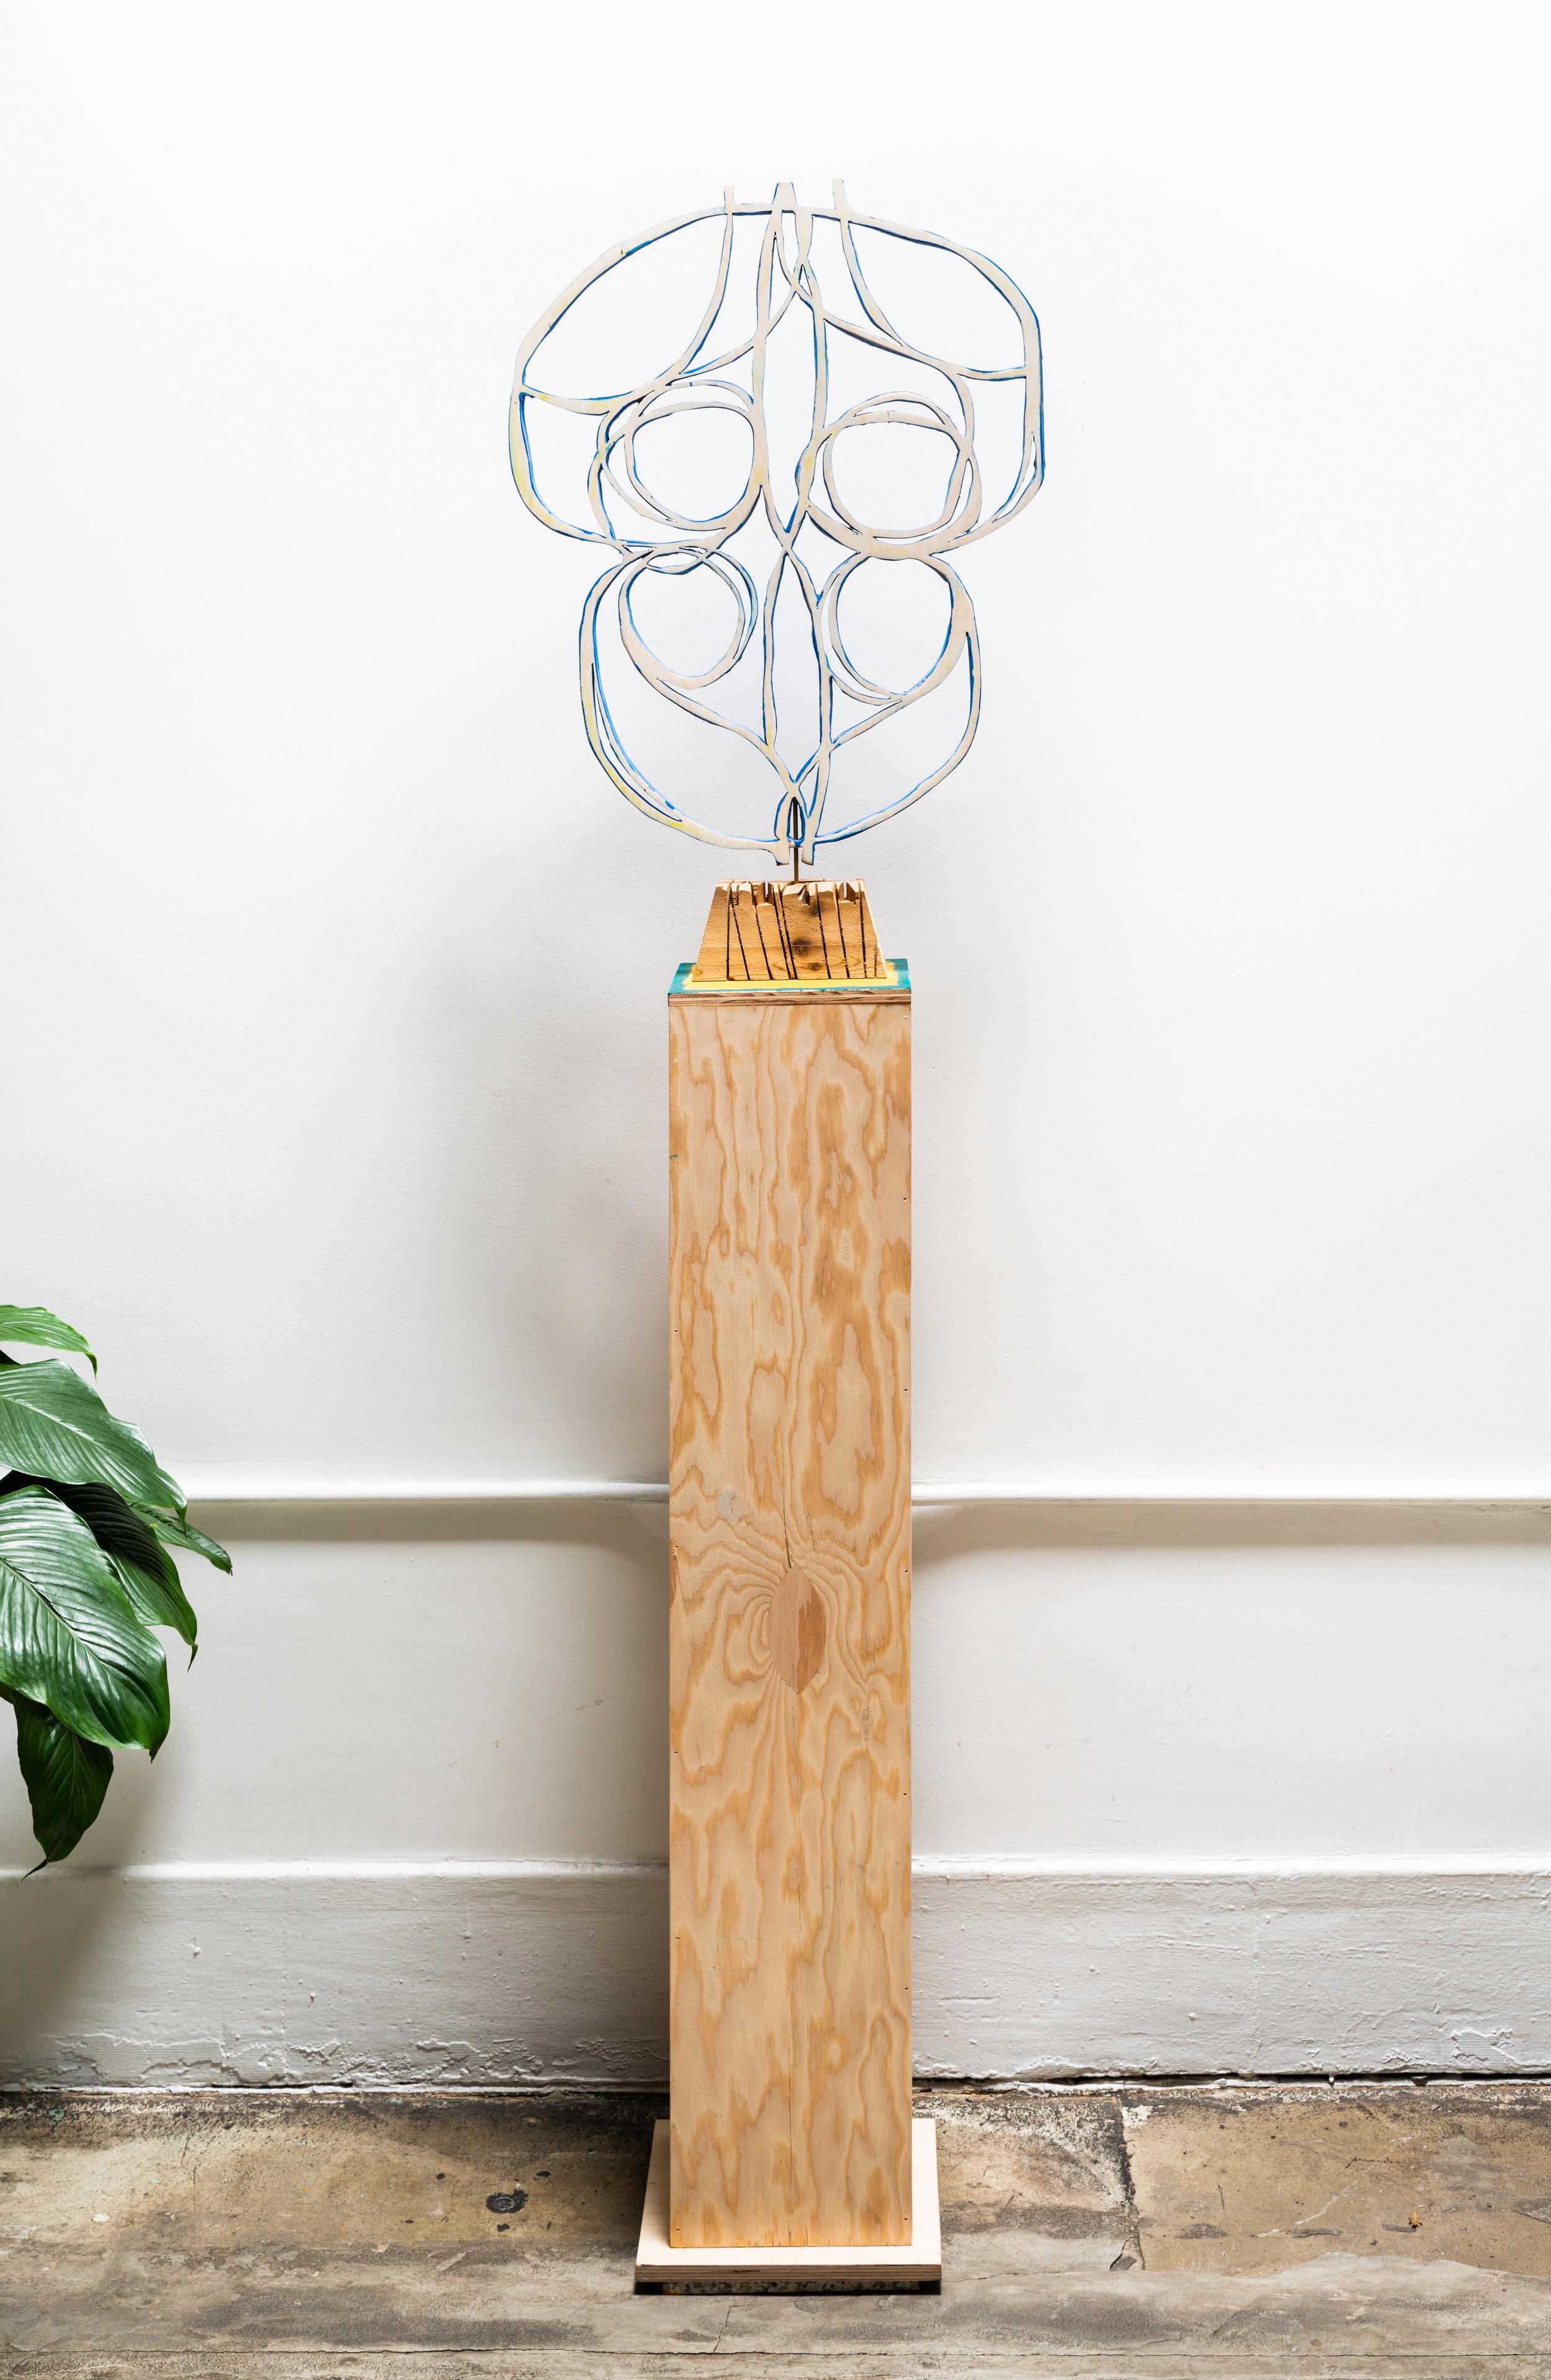 Untitled   2019  Birch ply, fir ply, flashe, colored pencil, cedar, steel